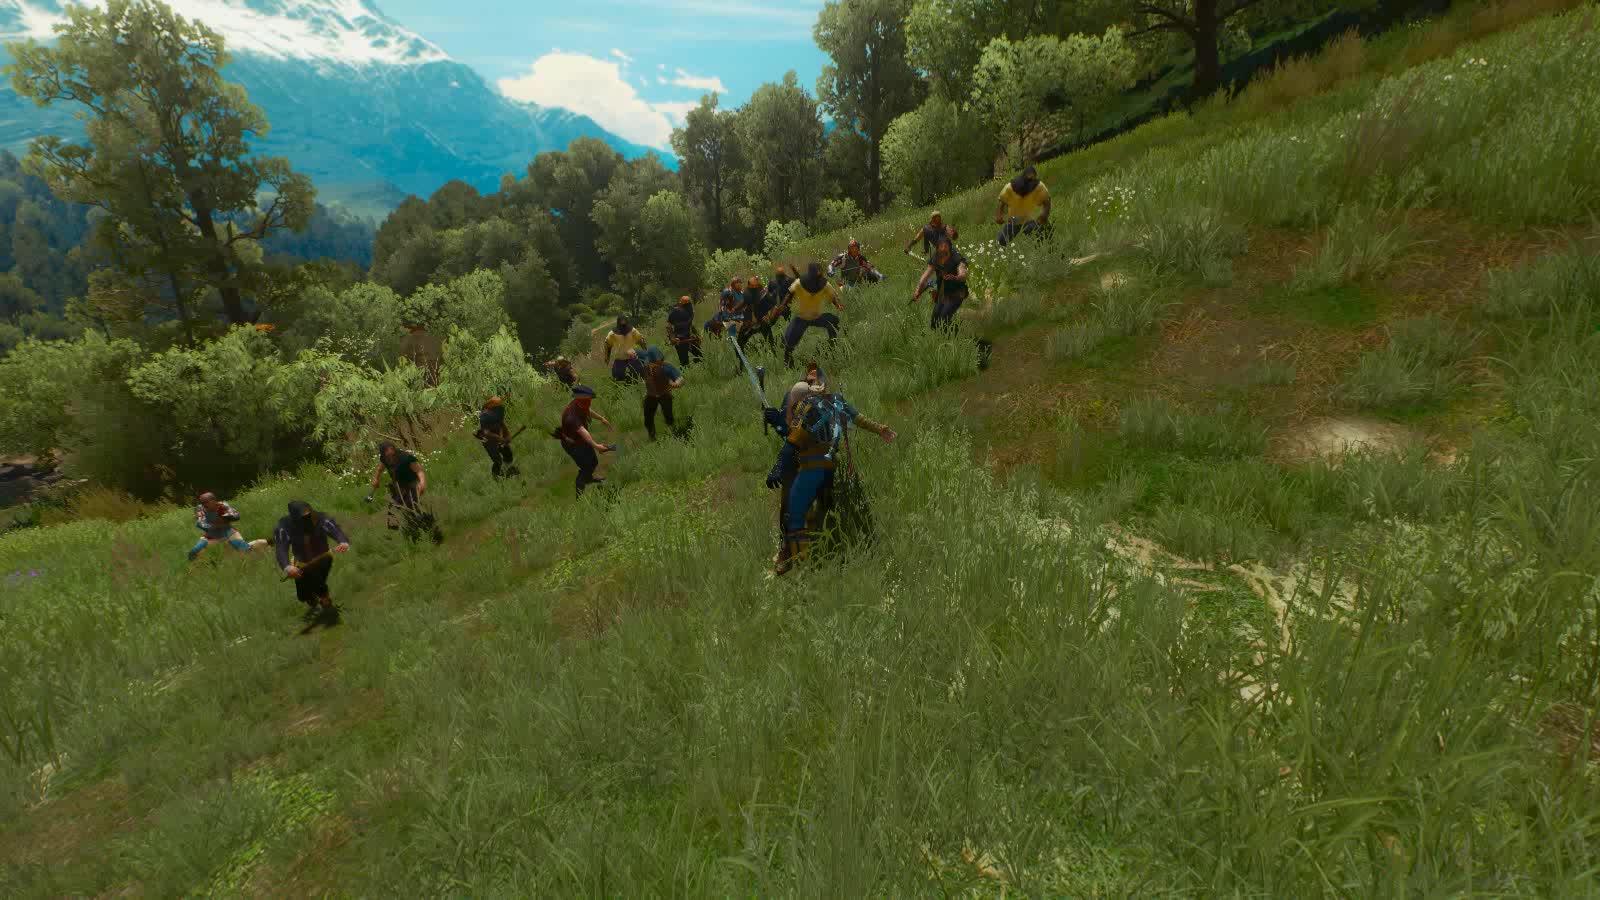 60fpsGamingGifs, What's the best single player game I should buy? (reddit) GIFs